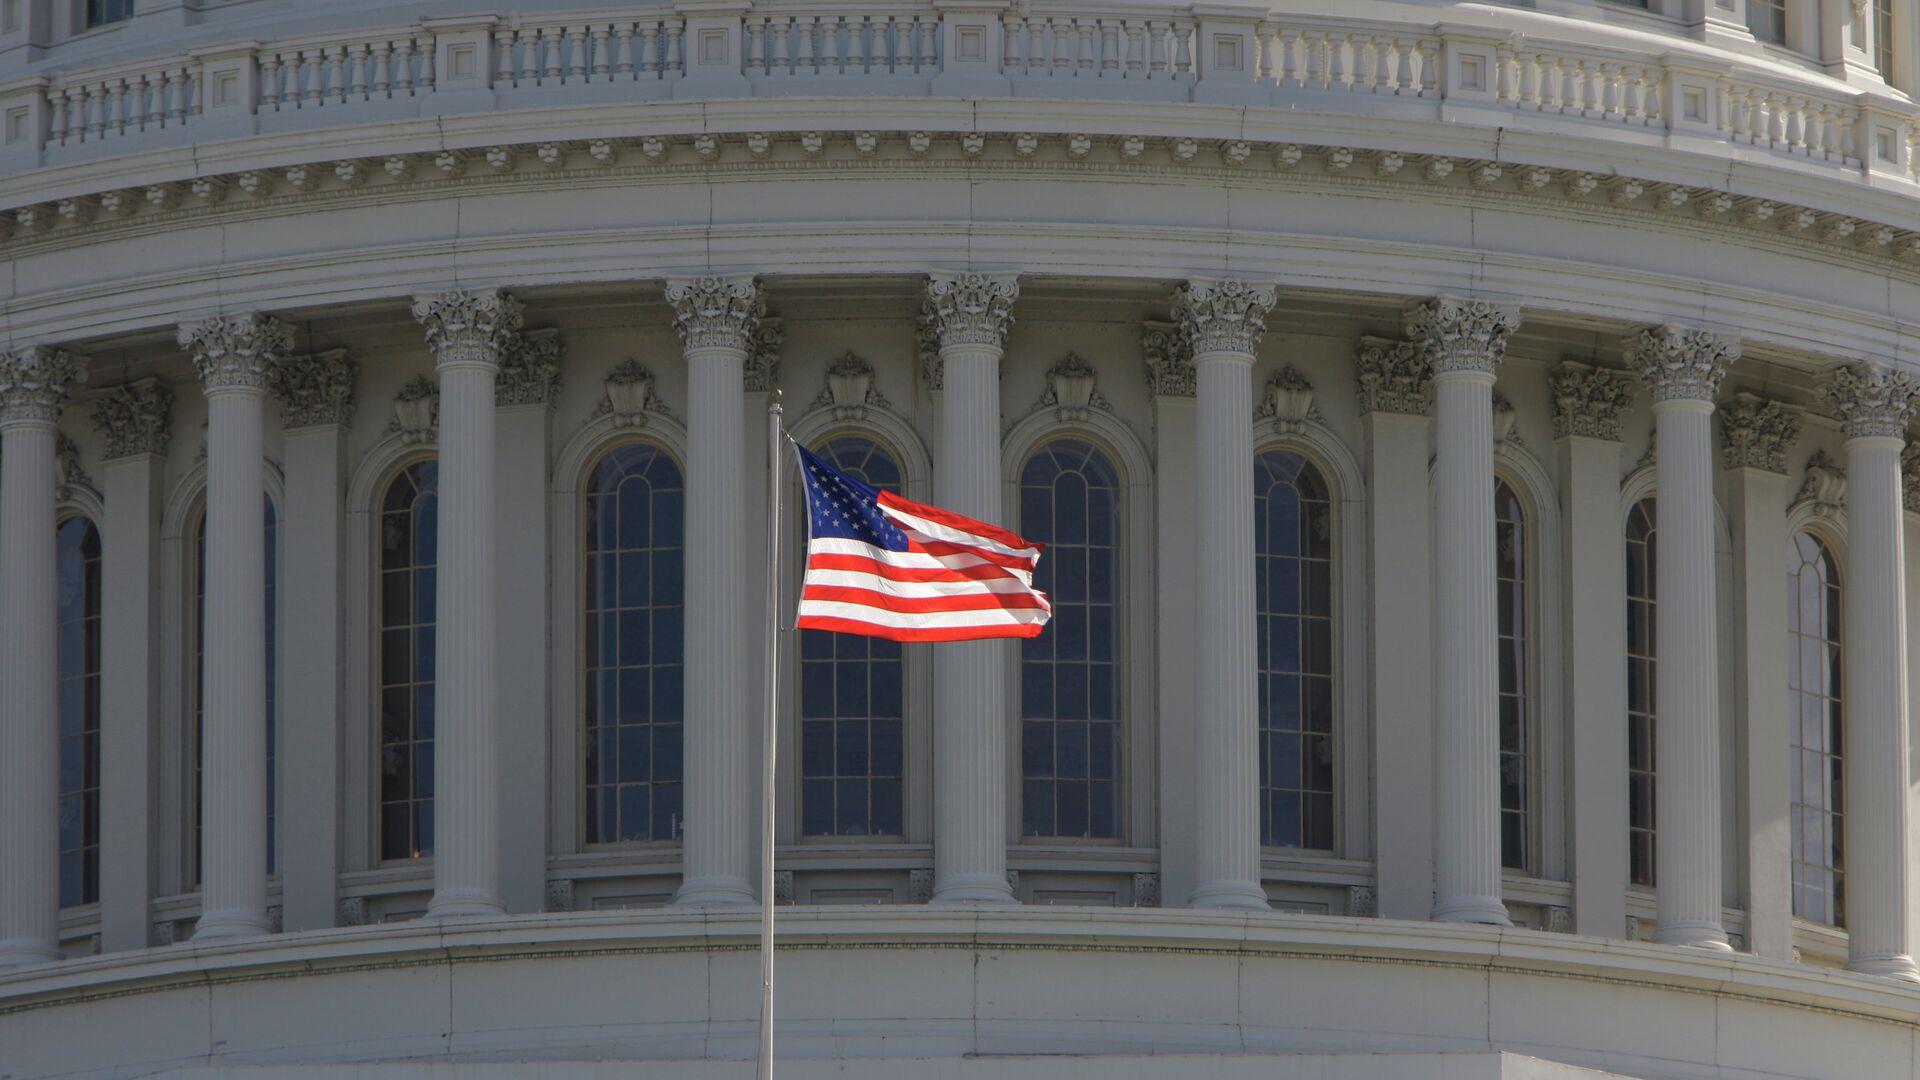 Bandera estadounidense frente al Capitolio de EEUU en Washington - Sputnik Mundo, 1920, 10.02.2021